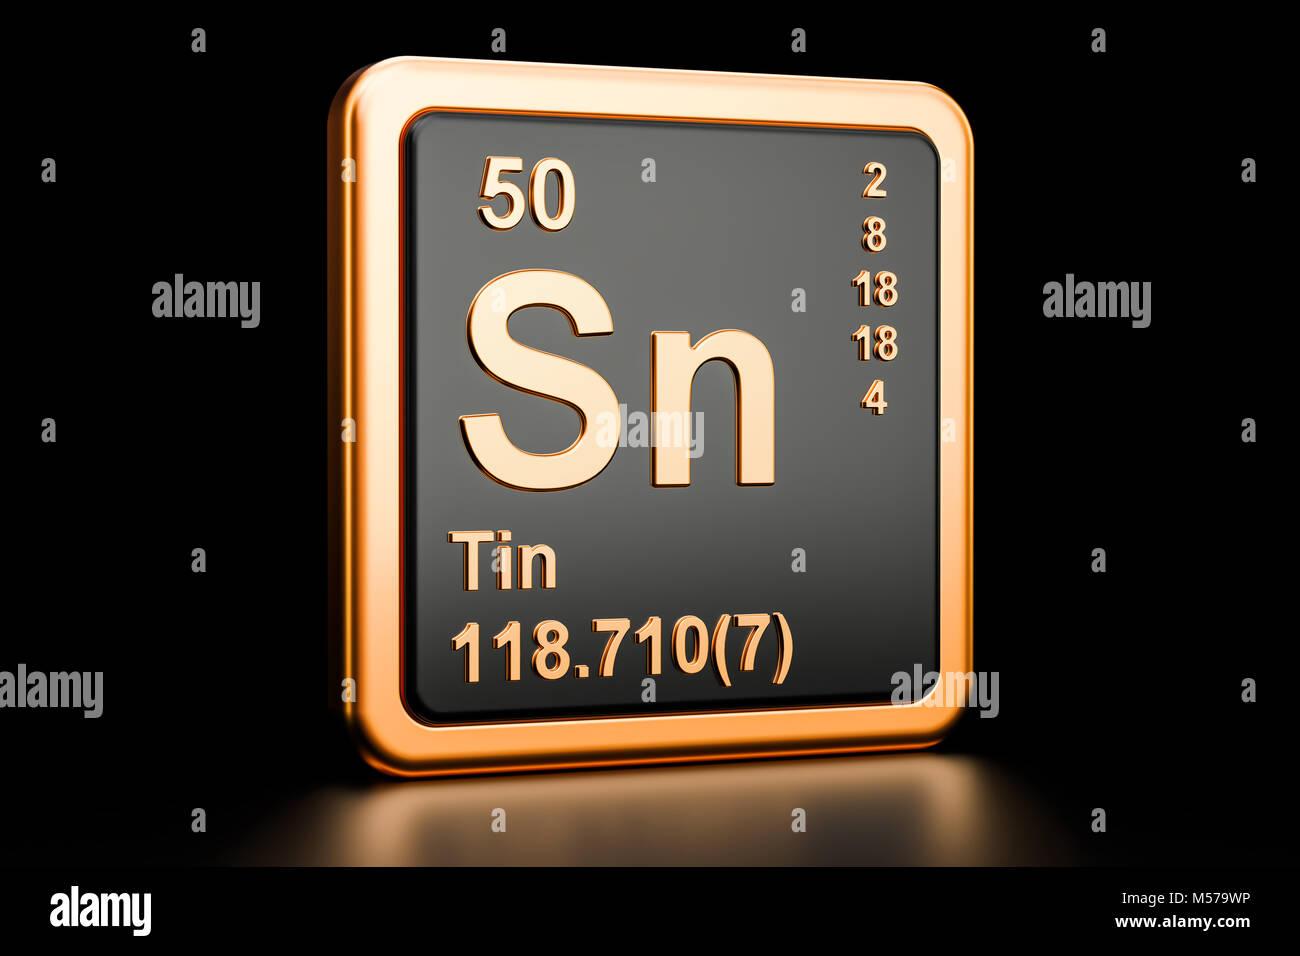 tin element